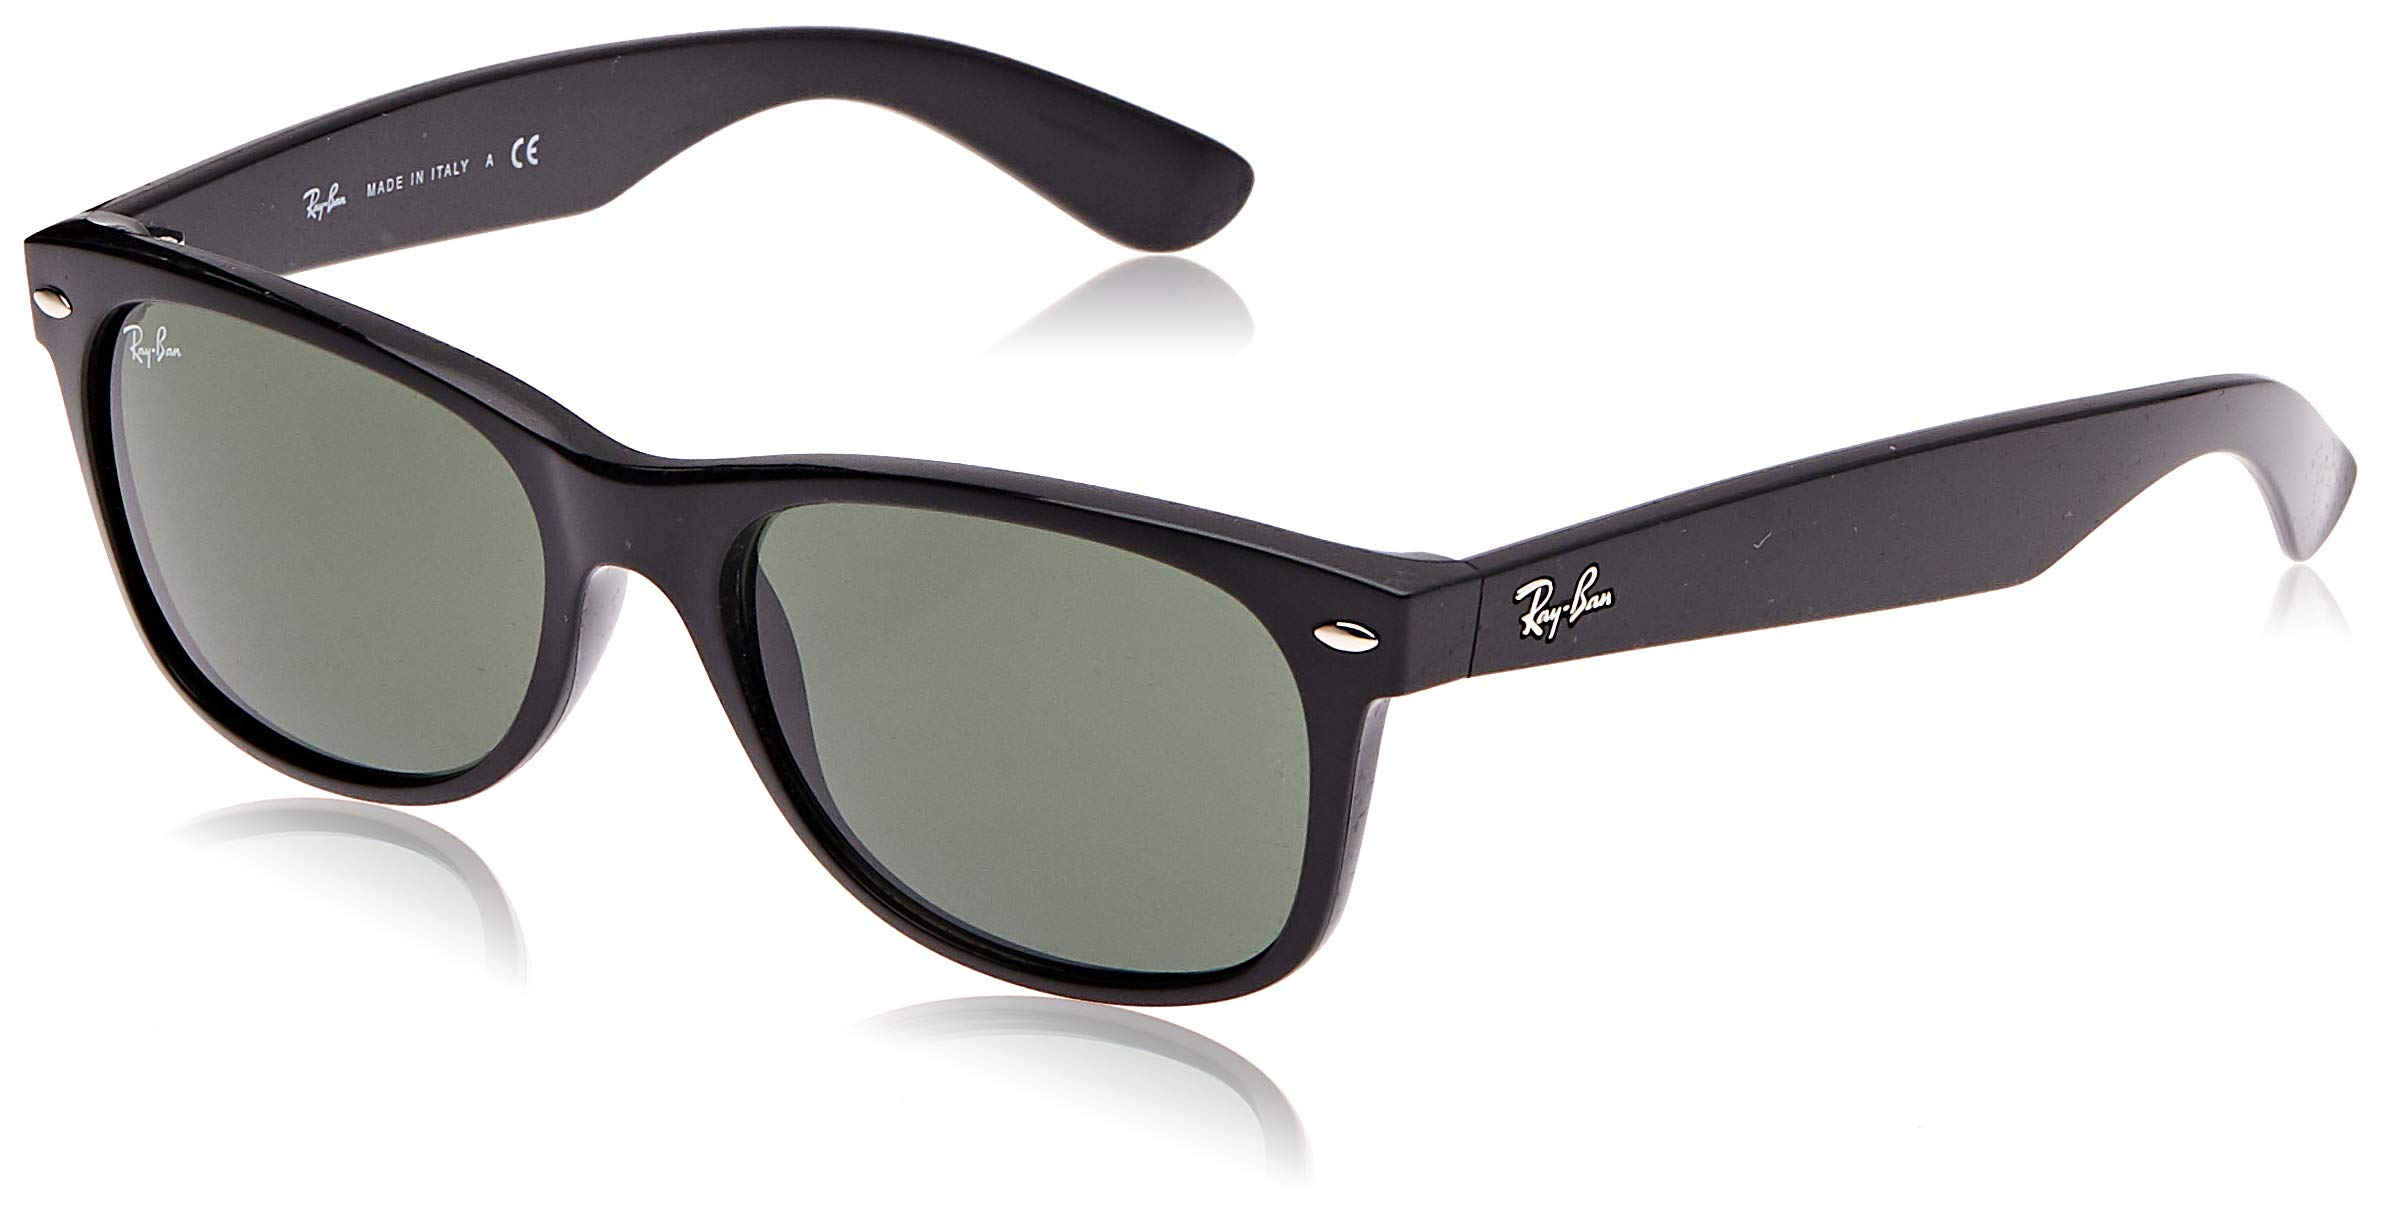 Ray-Ban RB2132 - New Wayfarer Non-Polarized Sunglasses Black Frame Crystal Green Lens Size 55 by RAY-BAN